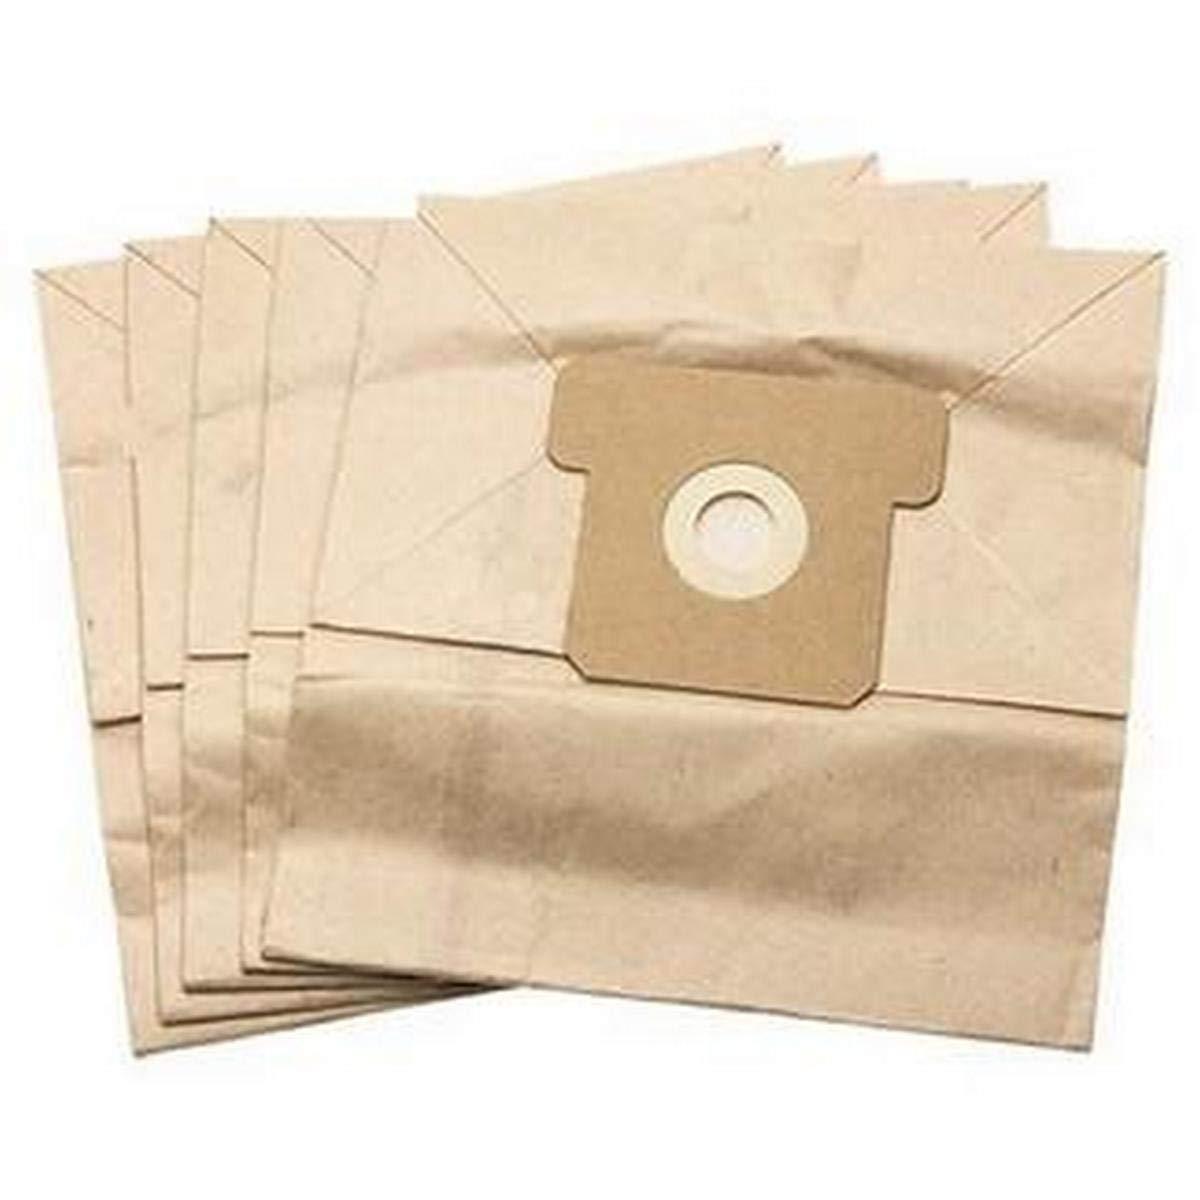 Hoover H10 bomb/ín de cerradura para aspiradora bolsas de papel la filtraci/ón de